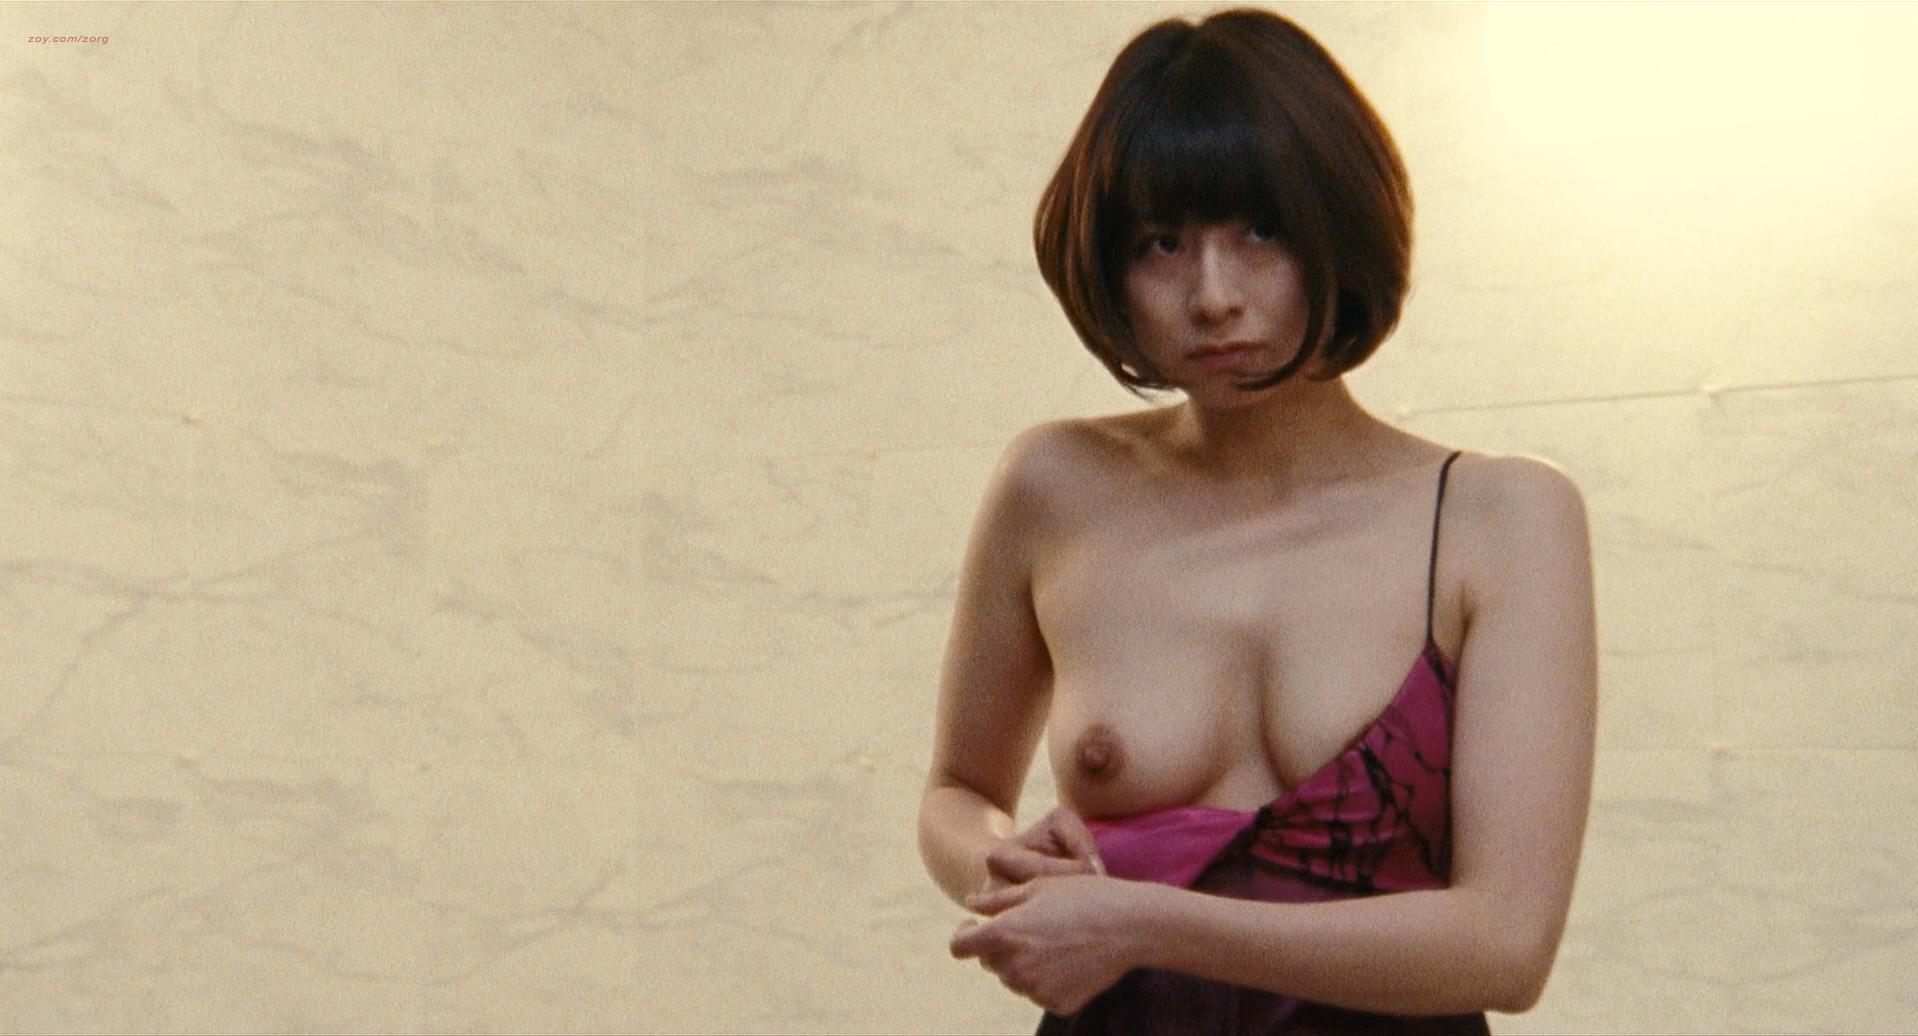 fuck-porn-japan-movie-nude-video-girl-having